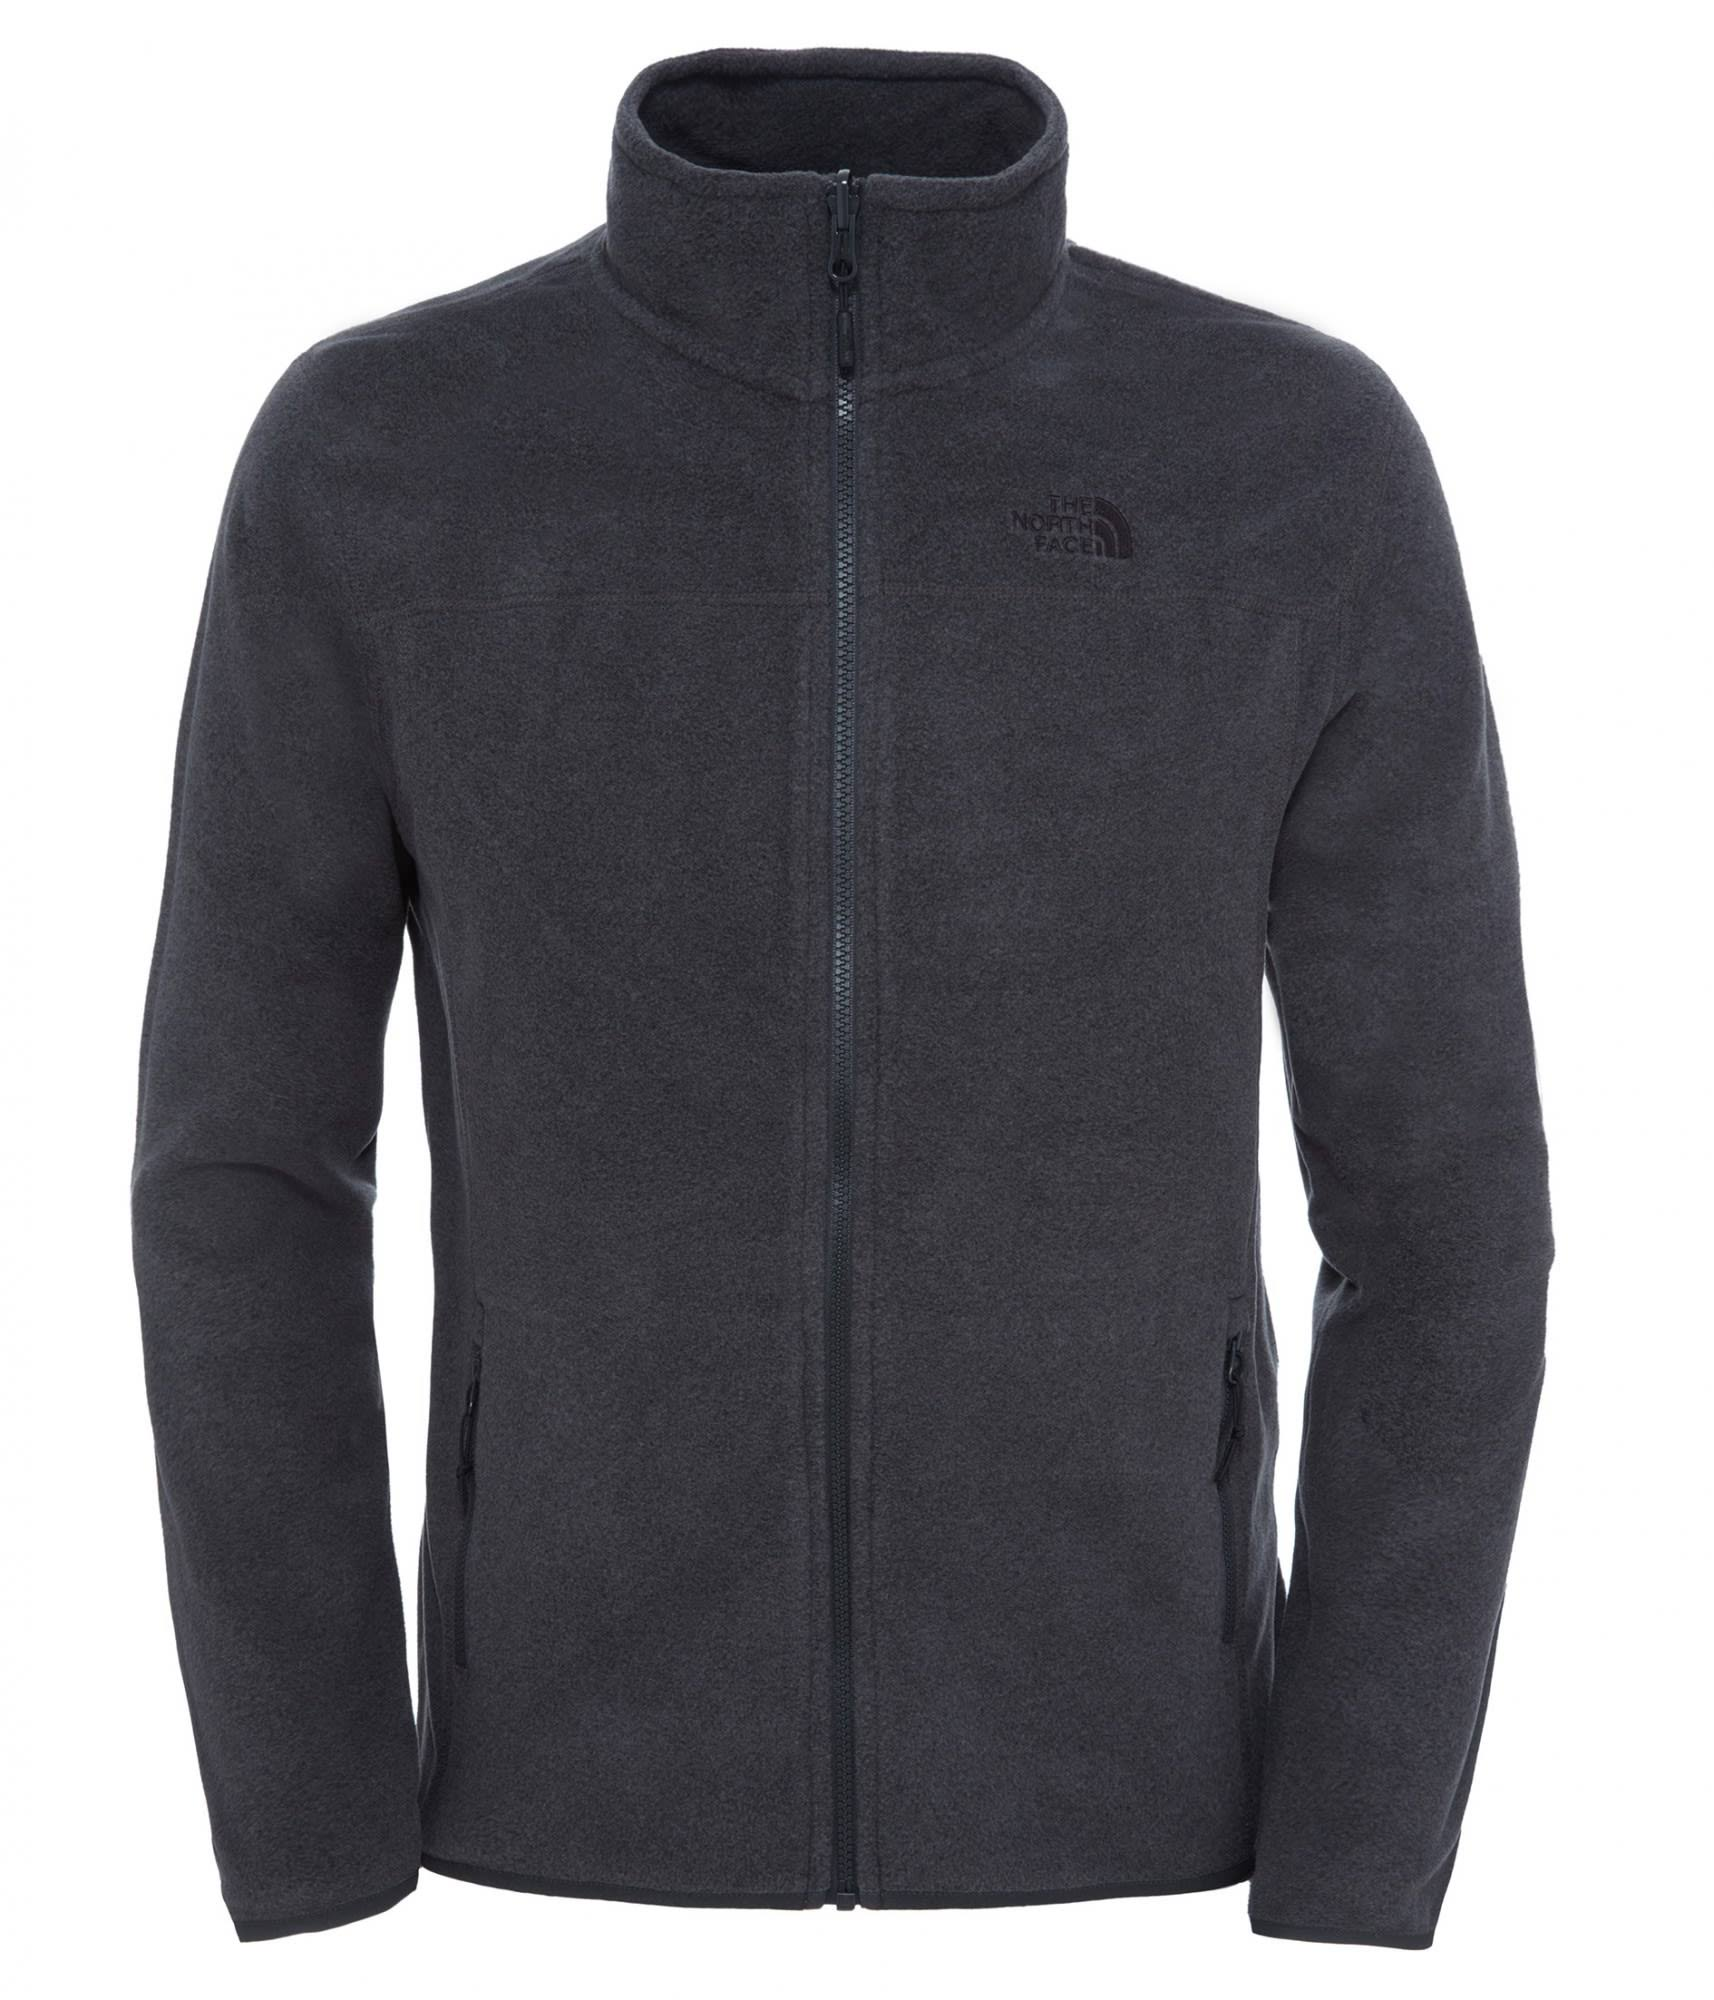 100 Fleece Glacier Gray Full Zip North The Jacket Face BqaE1cS